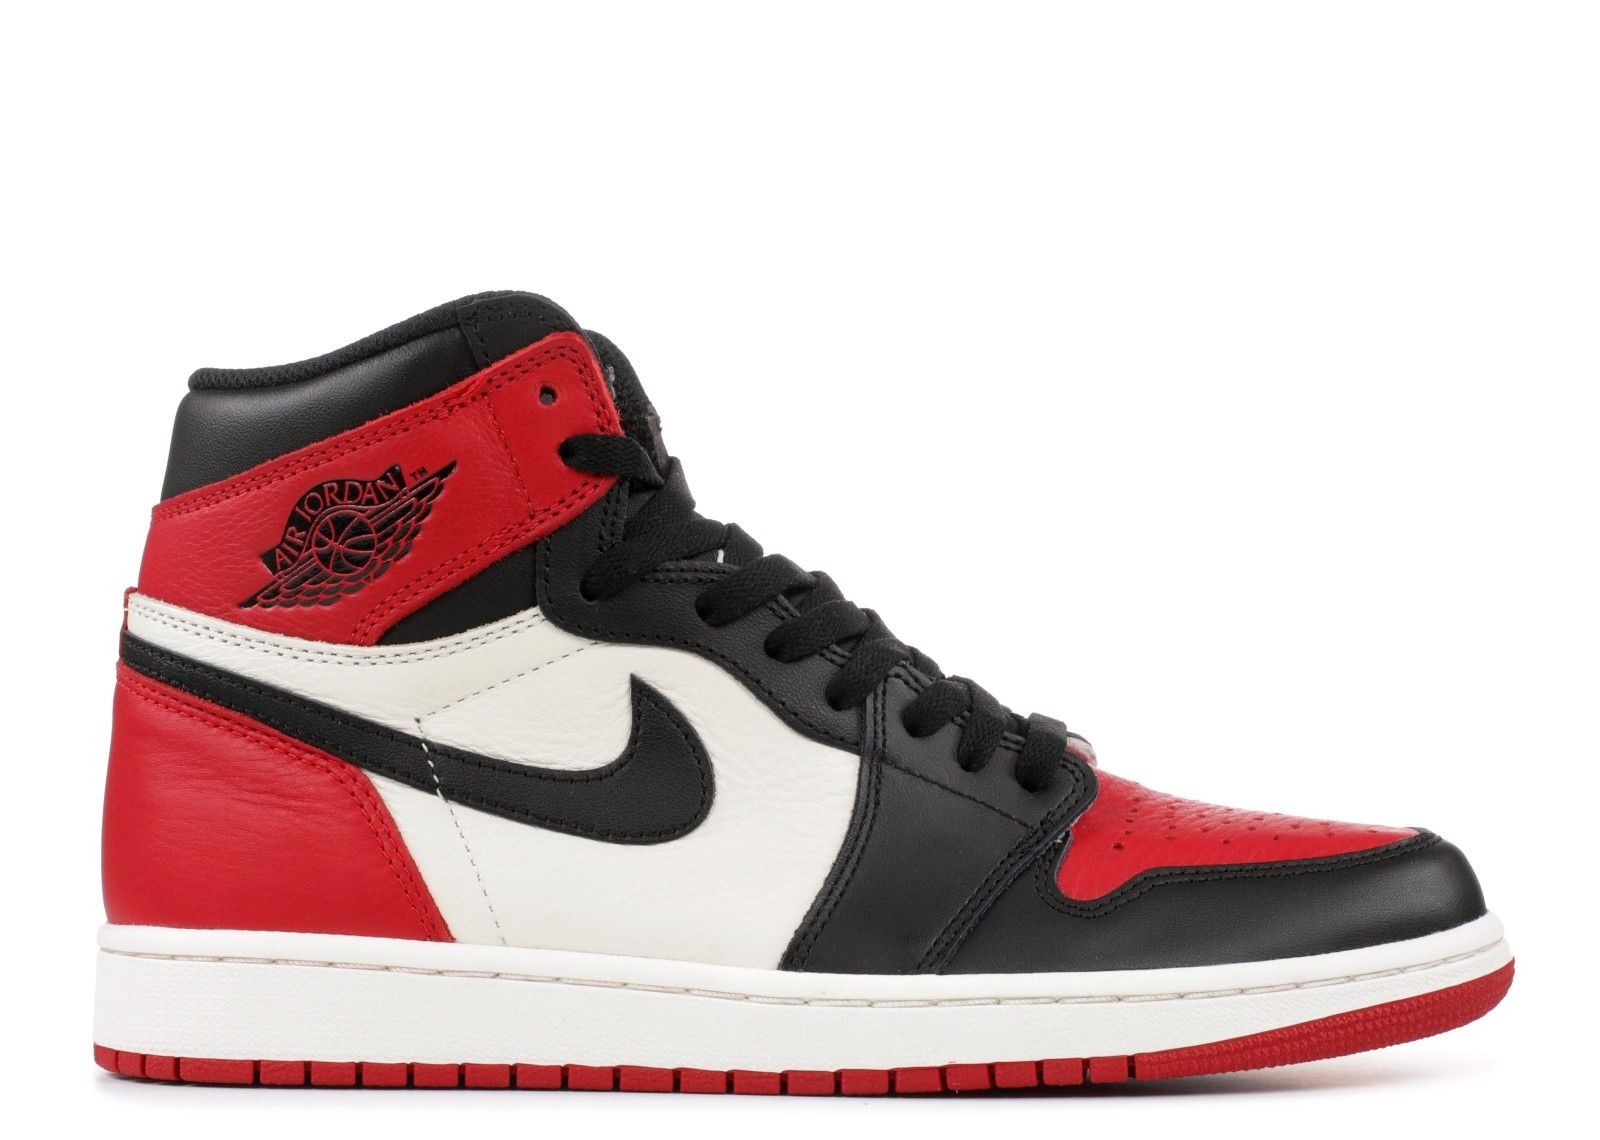 Air Jordan 1 I Retro High OG Bred Toe Gym RedBlackSummit